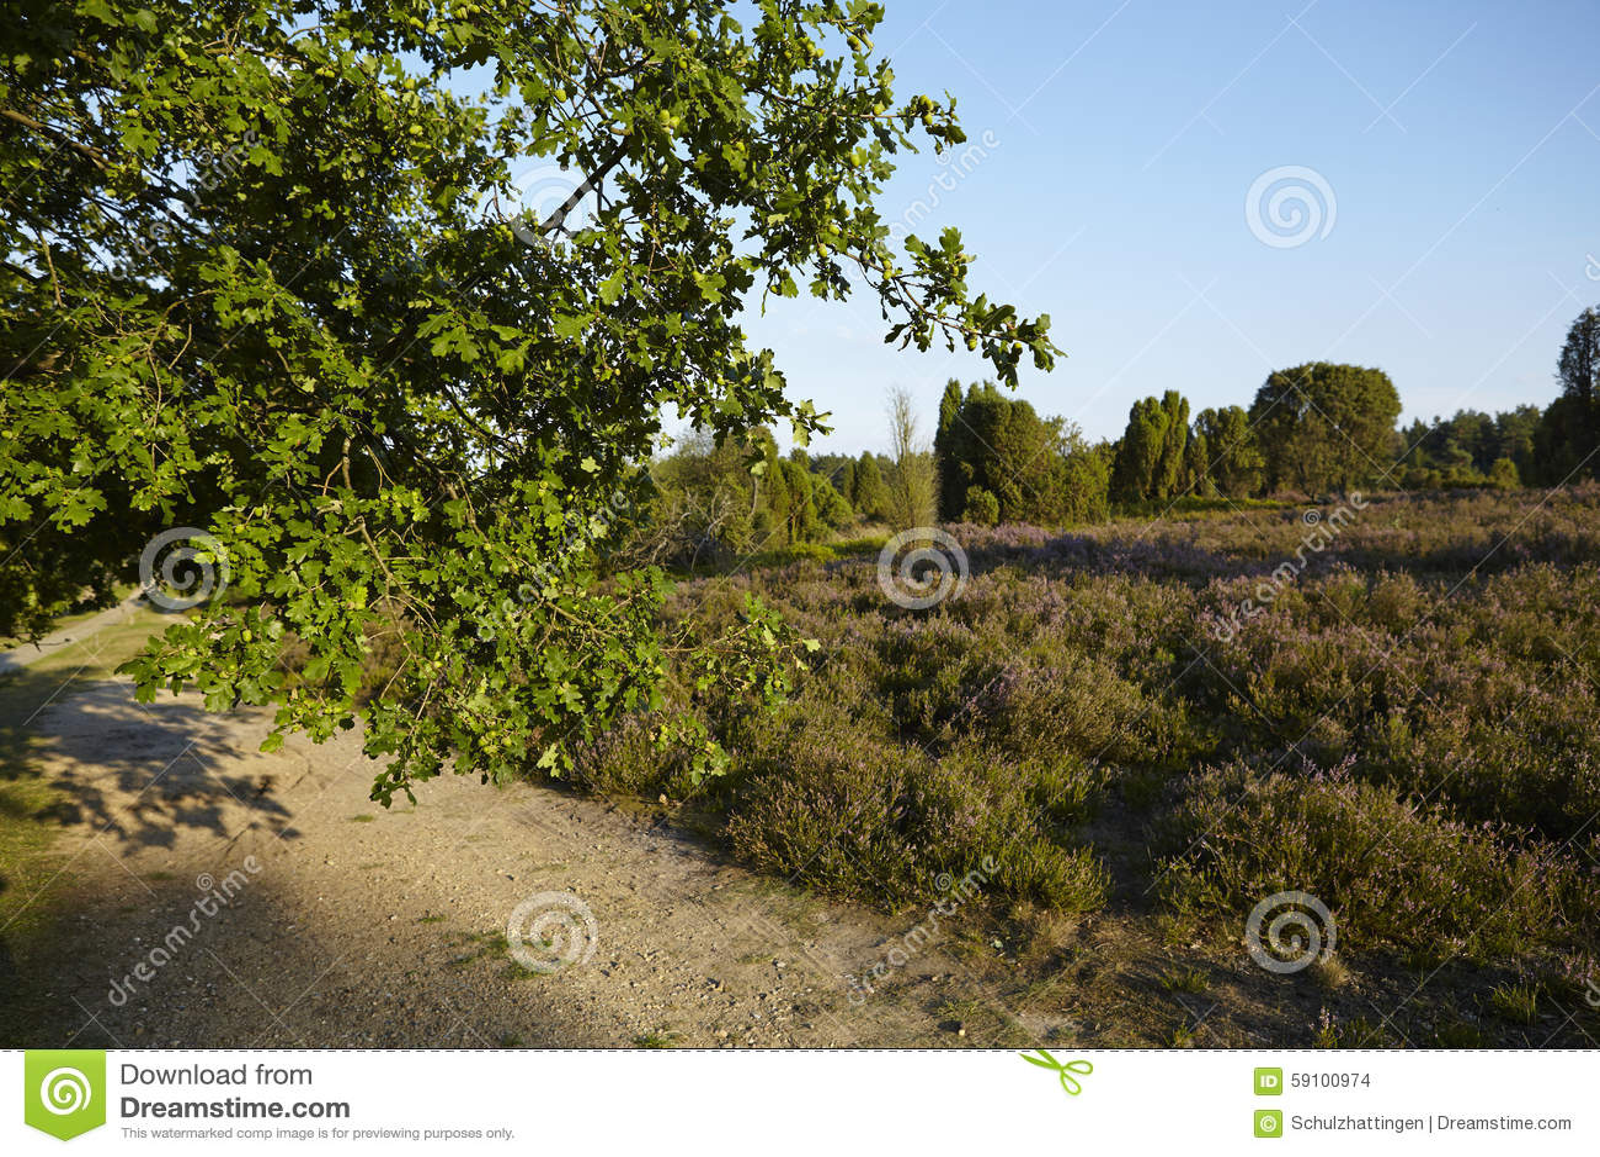 Luneburg荒地-橡树的早午餐和荒地环境美化